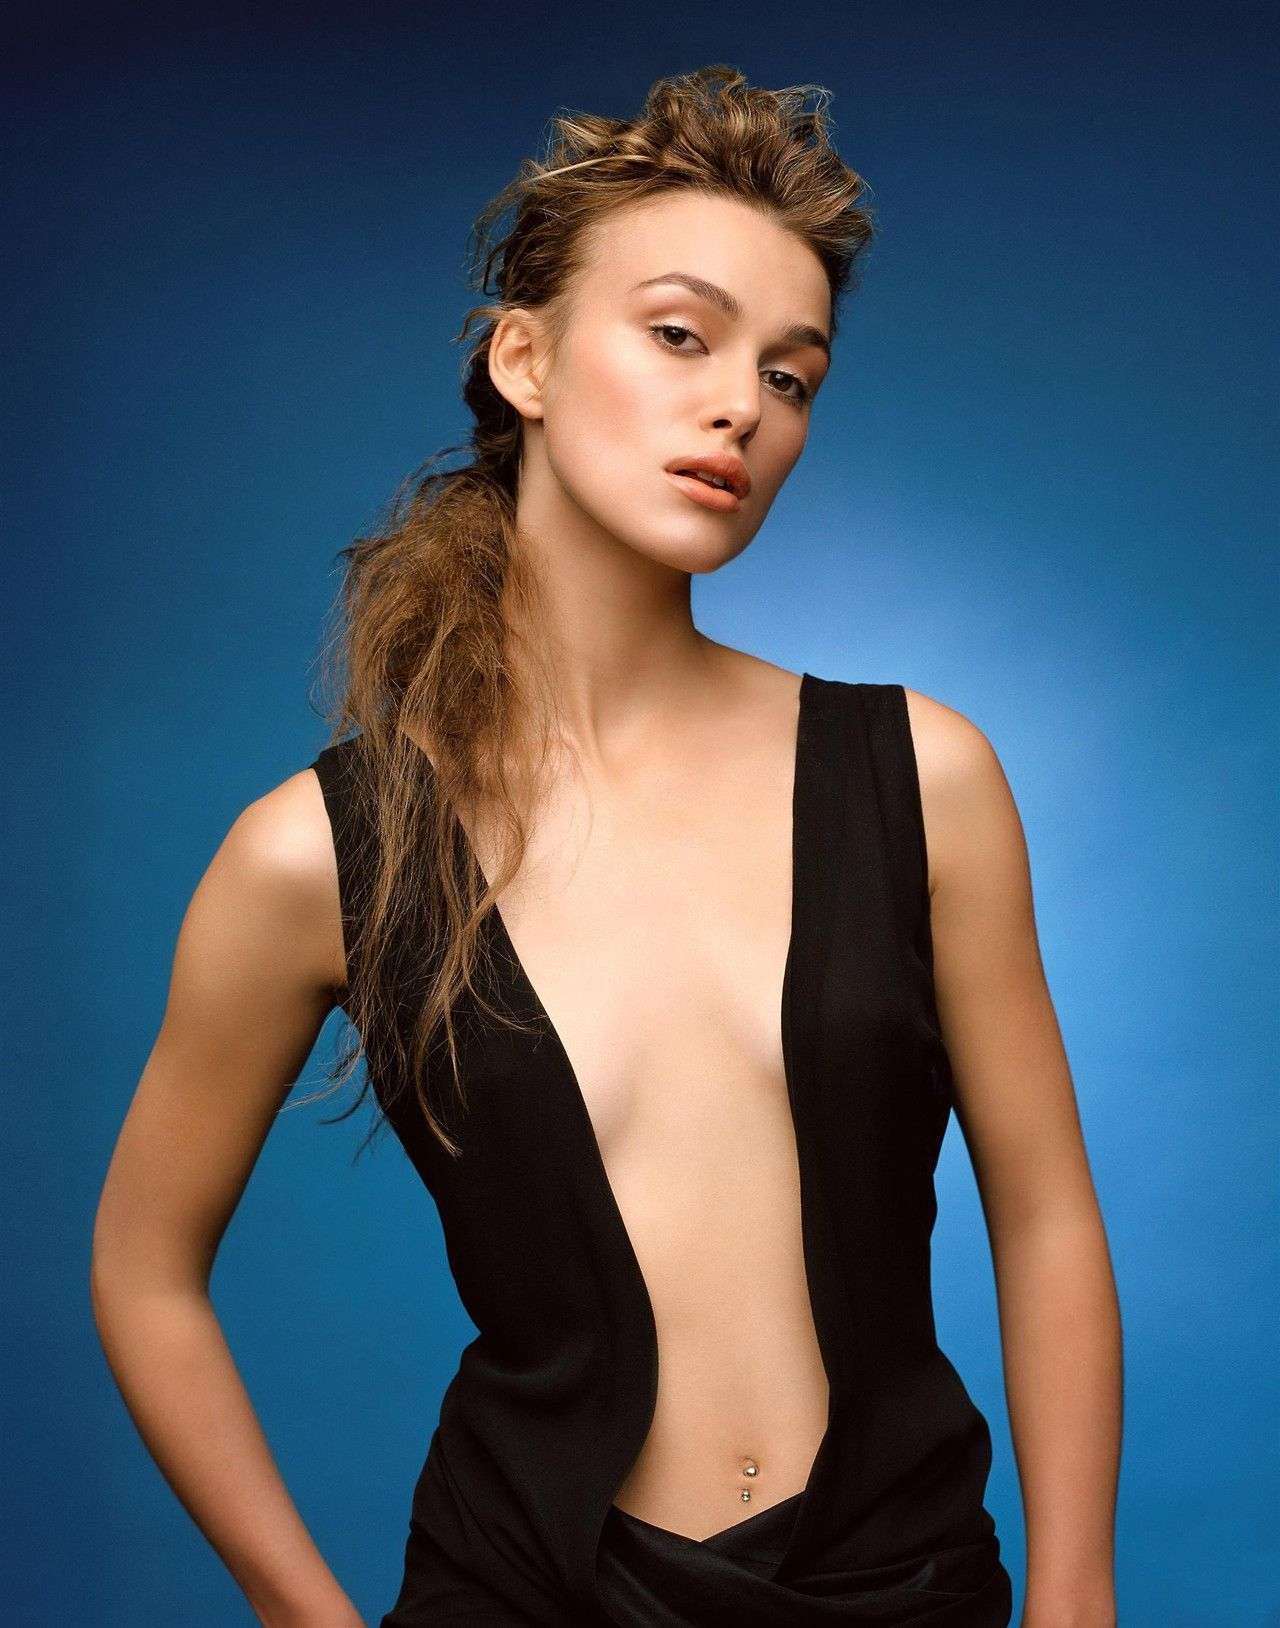 Keira Knightley (With images) | Keira knightley bikini